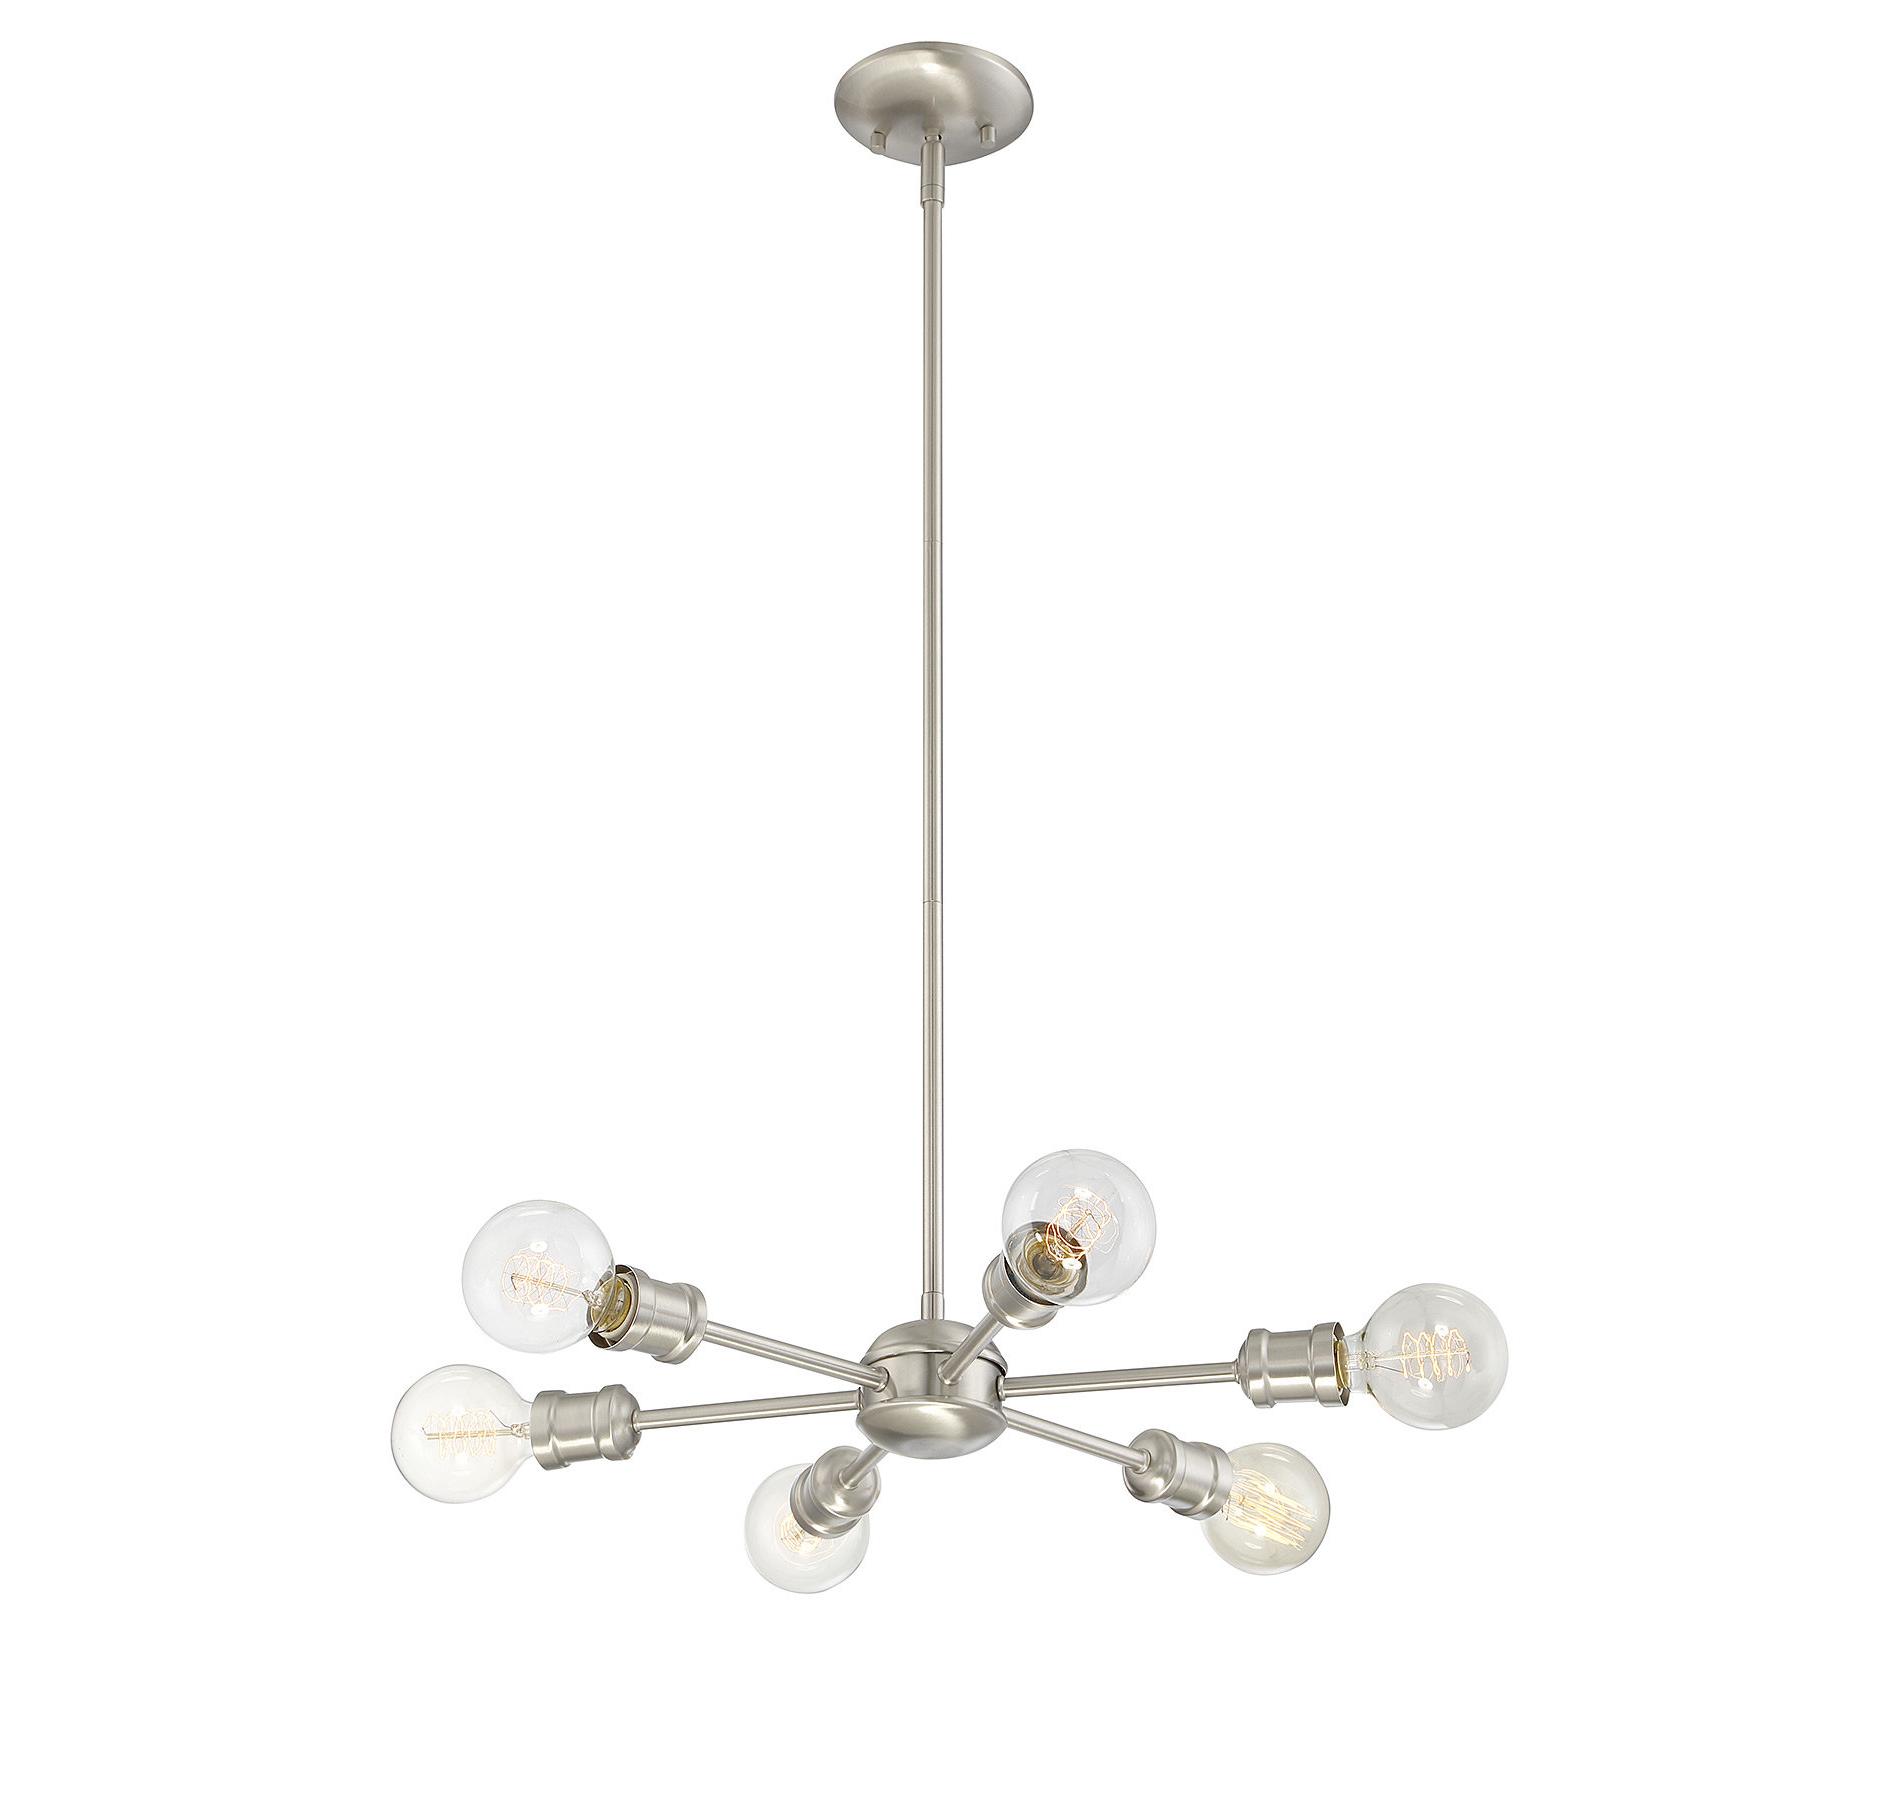 Most Recent Bautista 6 Light Sputnik Chandelier For Bautista 5 Light Sputnik Chandeliers (Gallery 13 of 20)